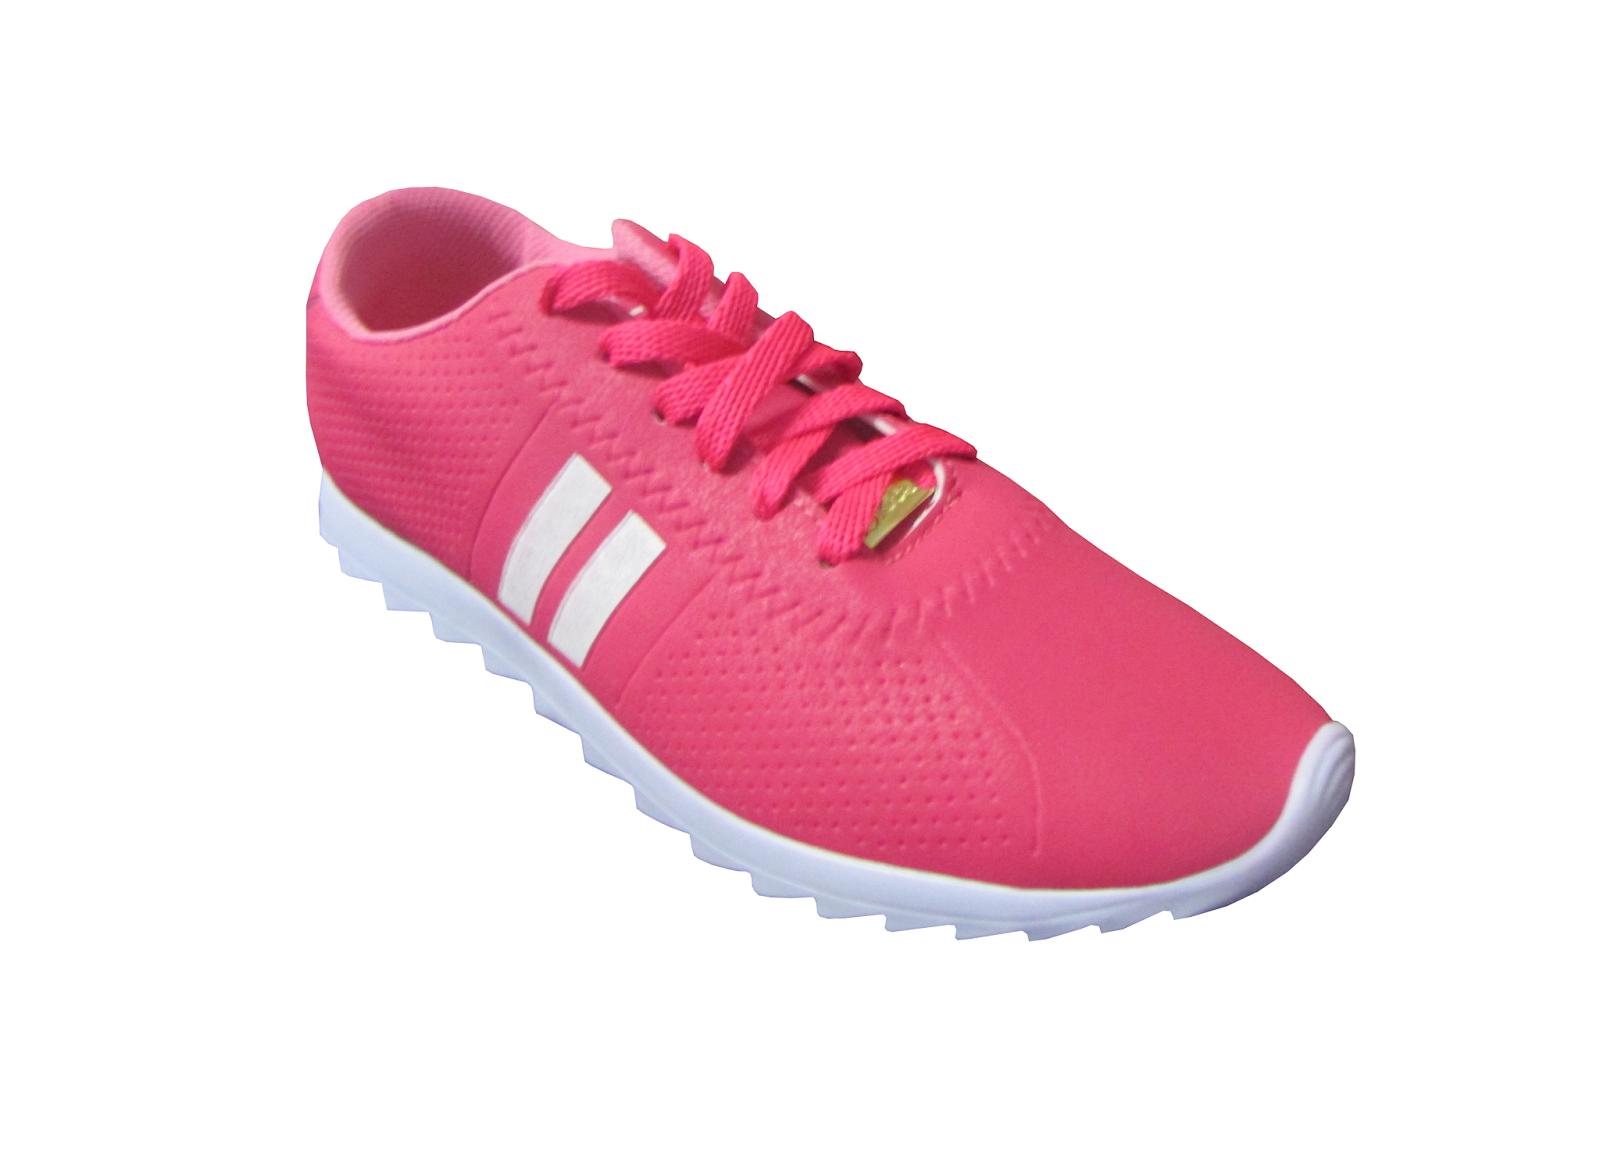 1e8a0b9699 Tenis sapatilha sapatenis barata adidas